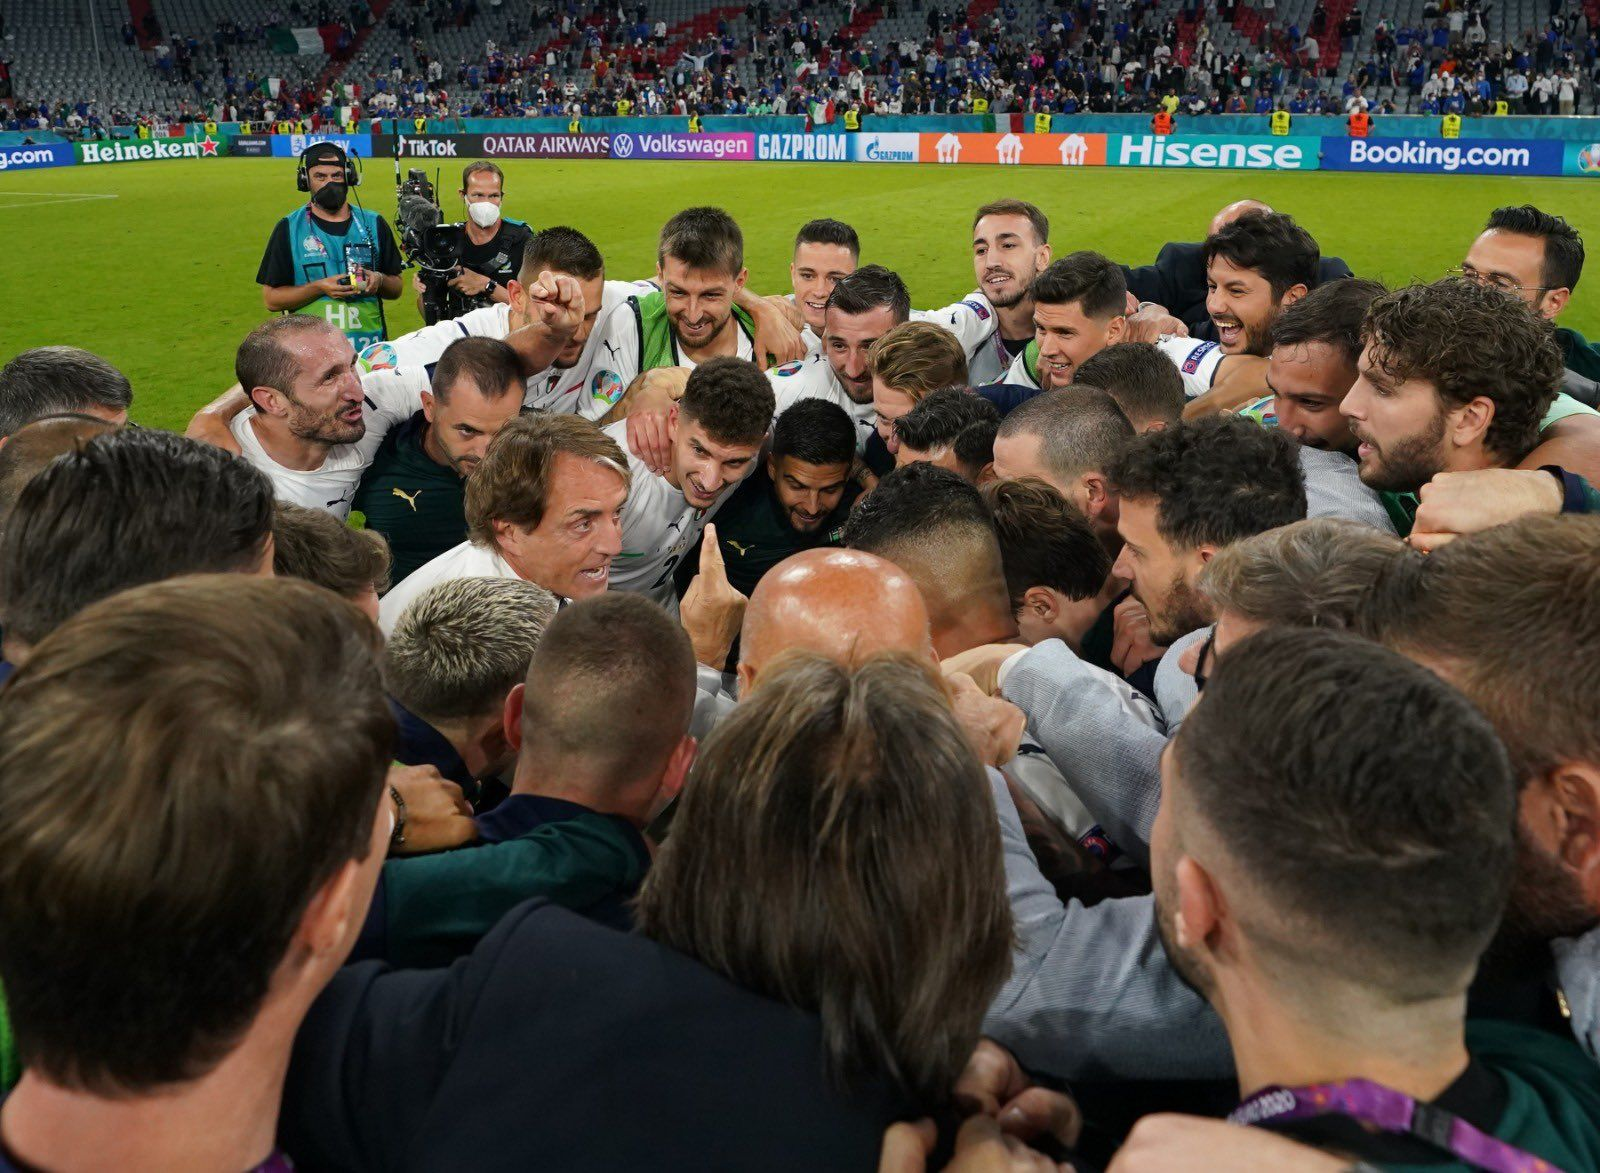 Italy beat Belgium at Euro 2020